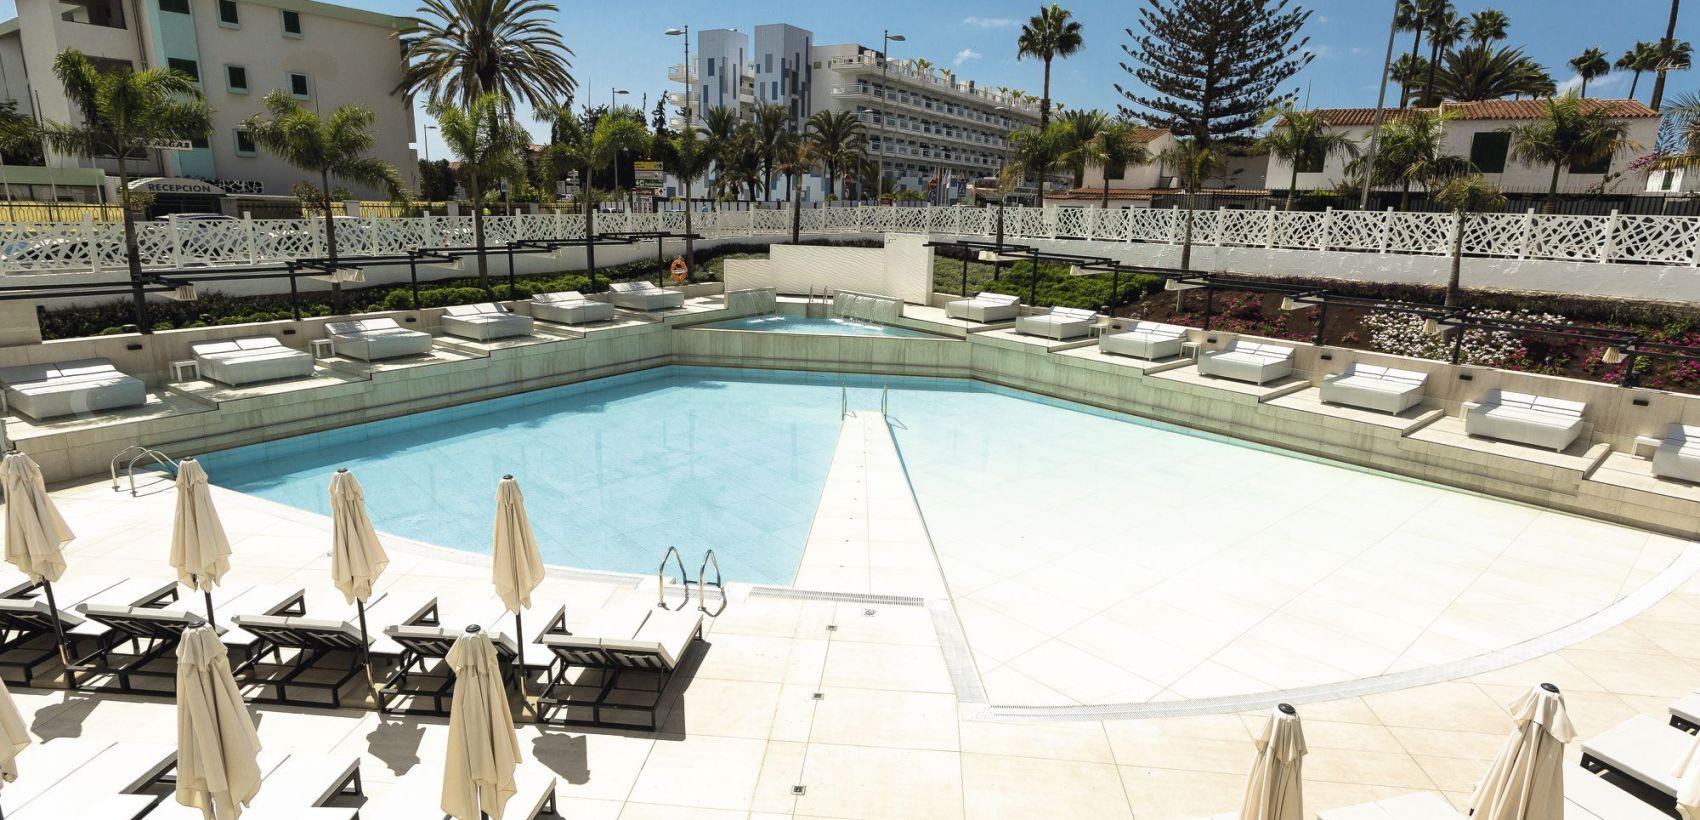 Funchal»Las Palmas | Hotéis em MP e TI - Lugares Garantidos